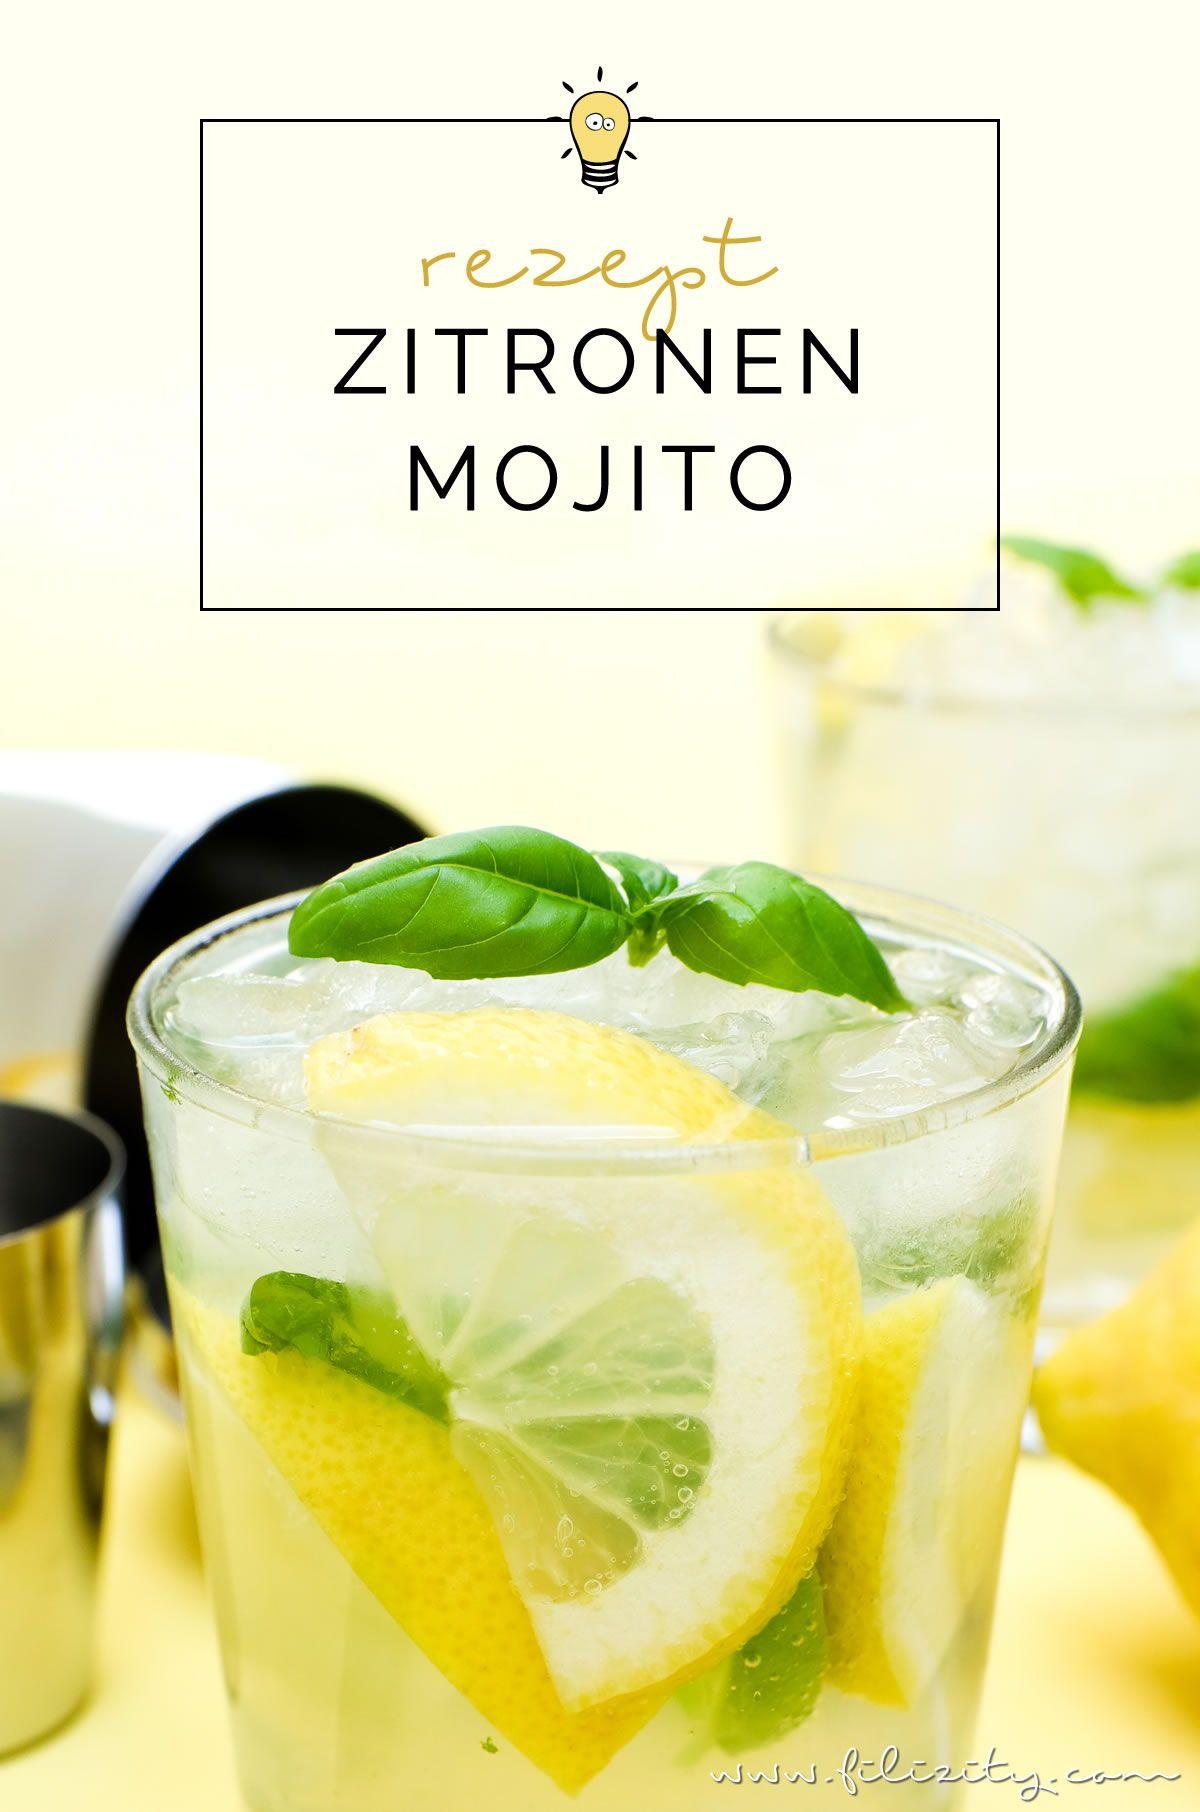 Rezept Fur Zitronen Mojito Der Cocktail Klassiker Mal Anders Filizity Com Food Blog Aus Dem Rheinland Mojito Rezept Mojito Coctail Rezepte